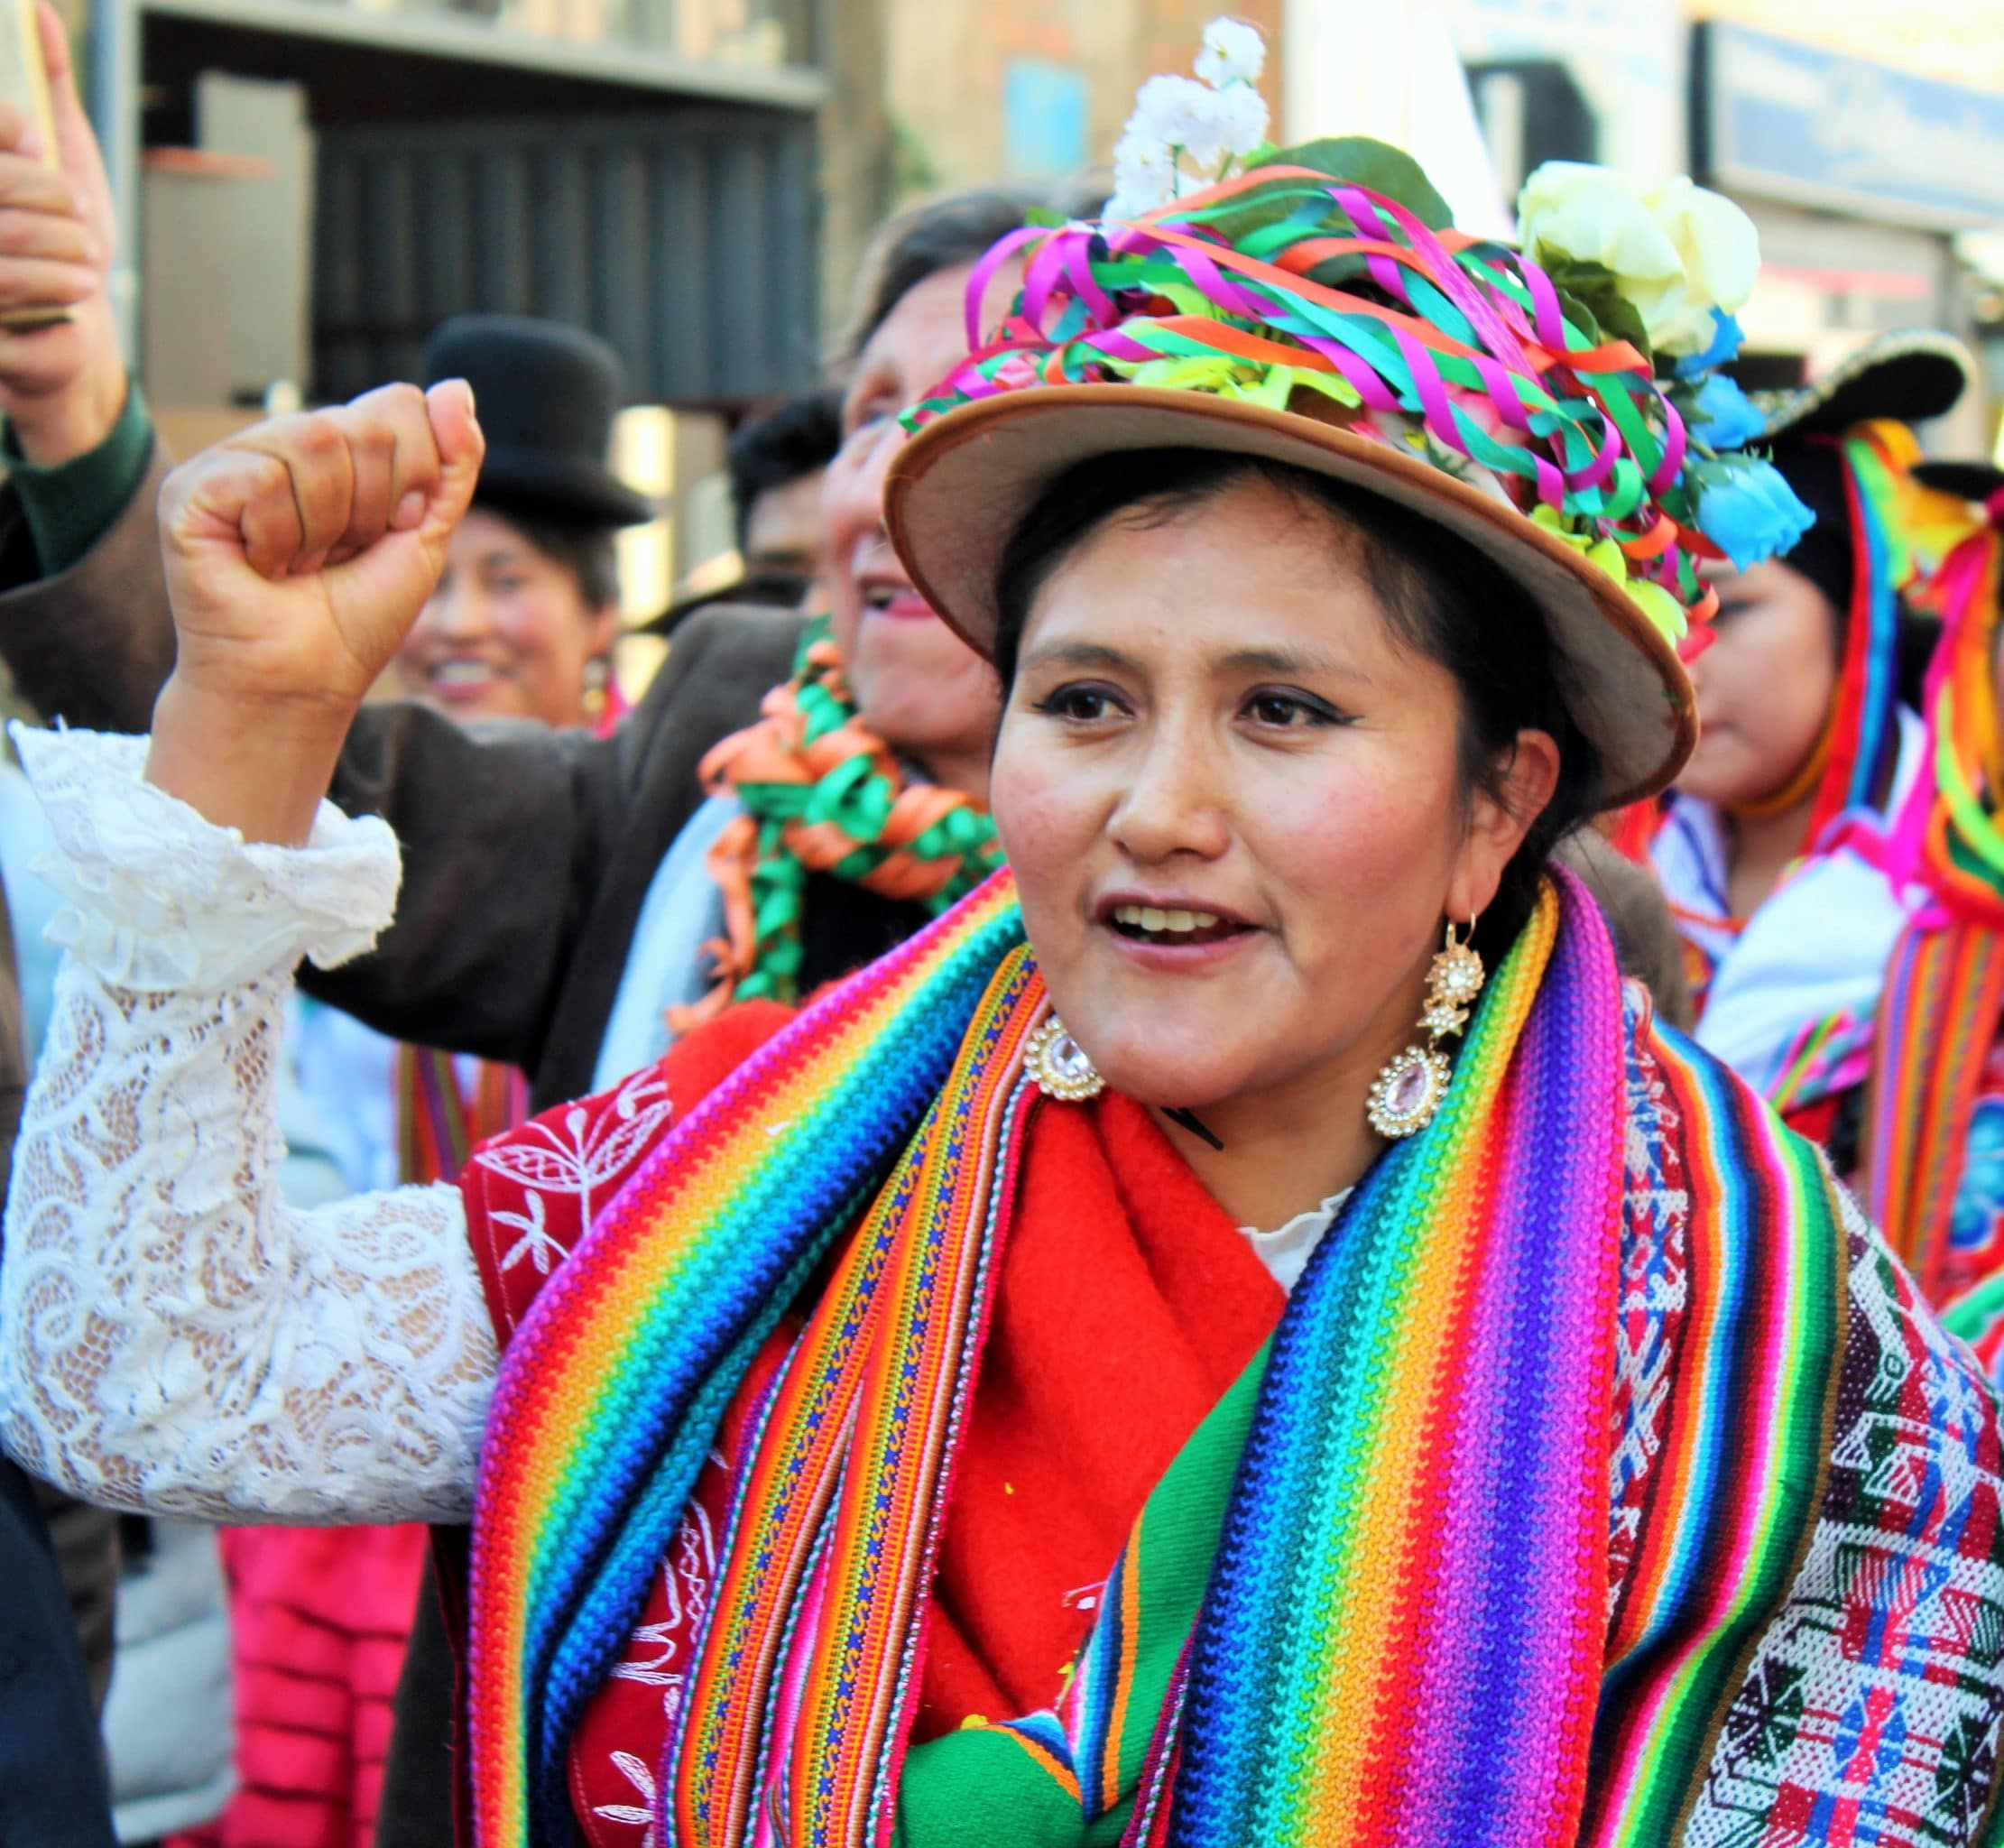 Sonia Marlene Calderón